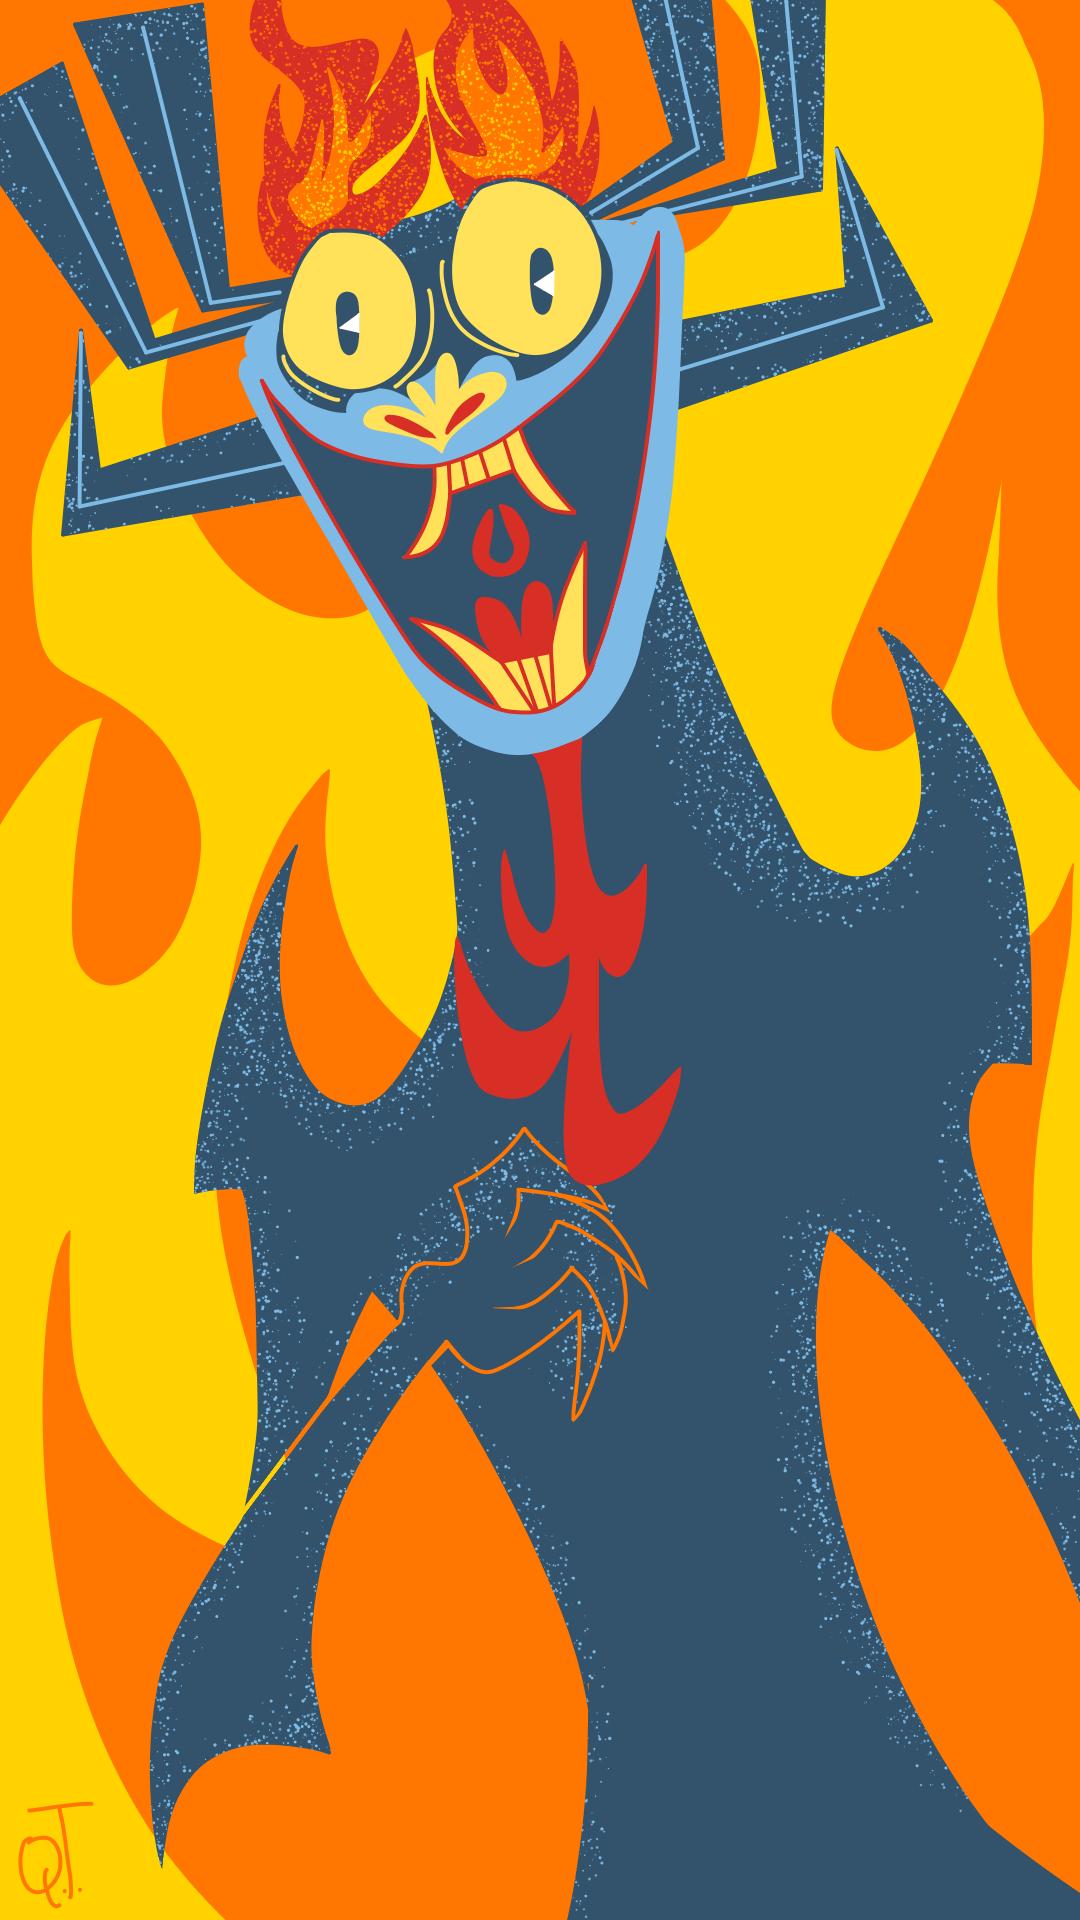 For no reason, here's Aku